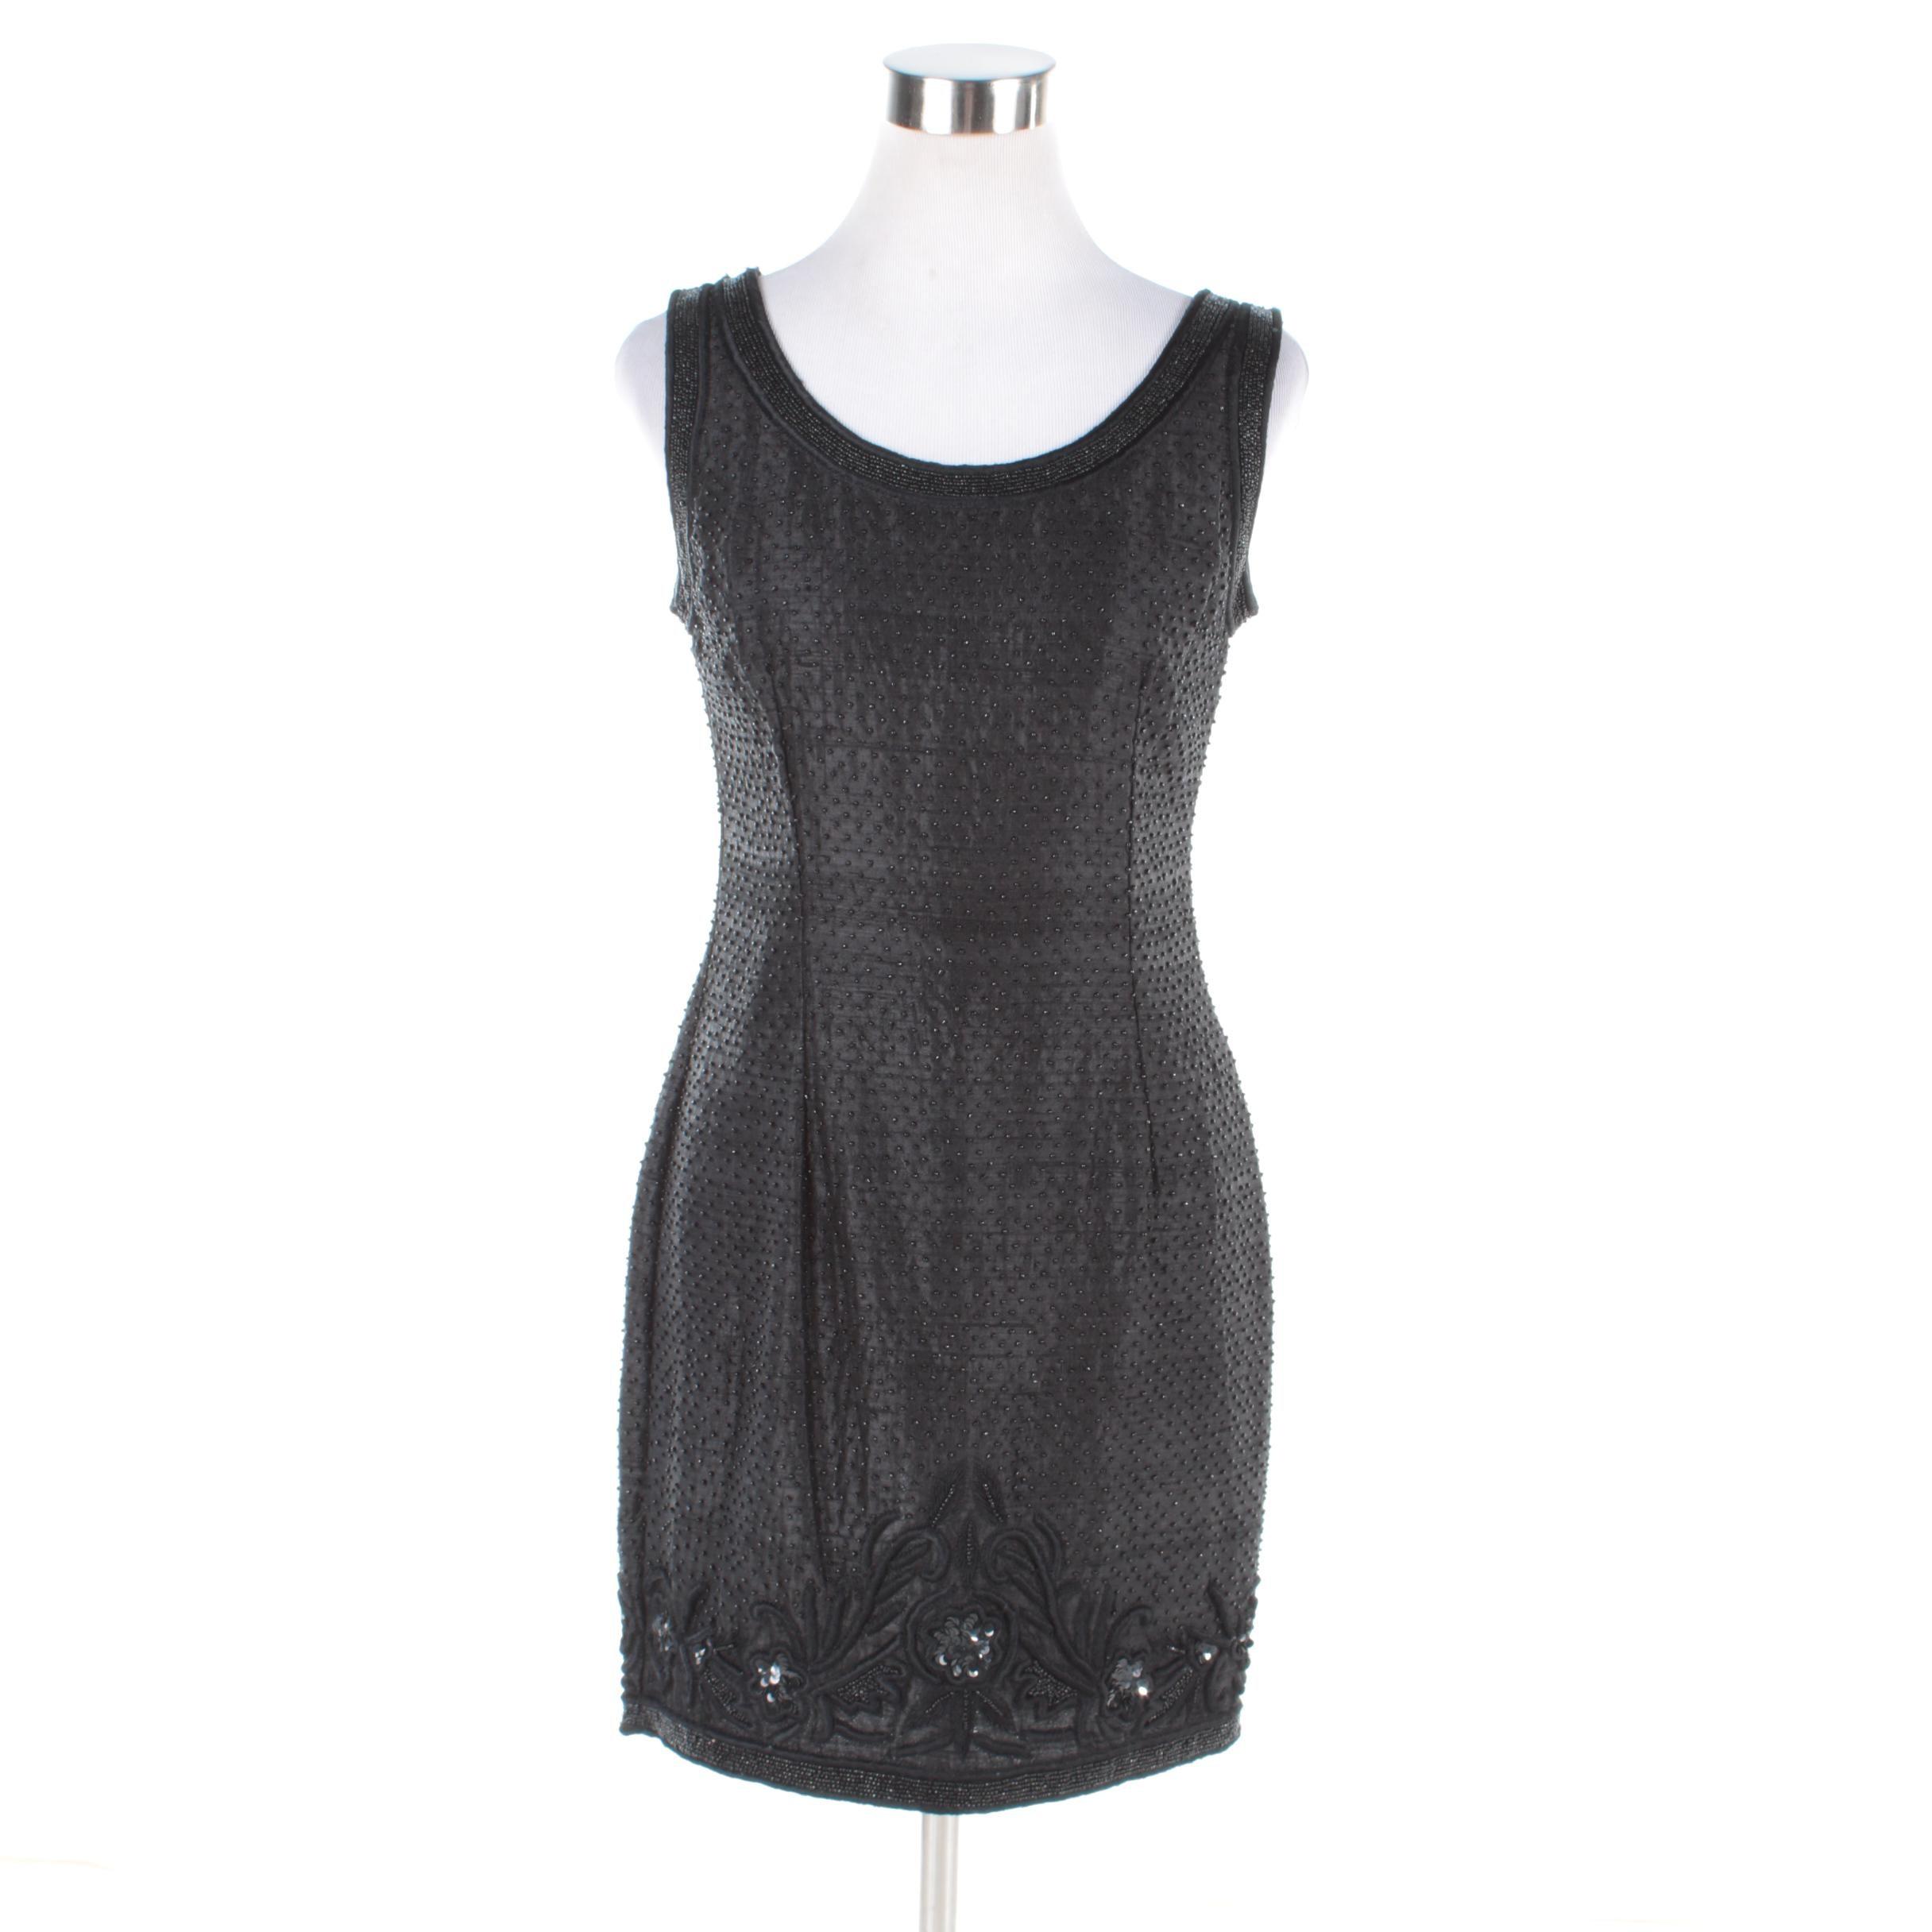 Caroline Rose Embellished Black Sleeveless Cocktail Dress